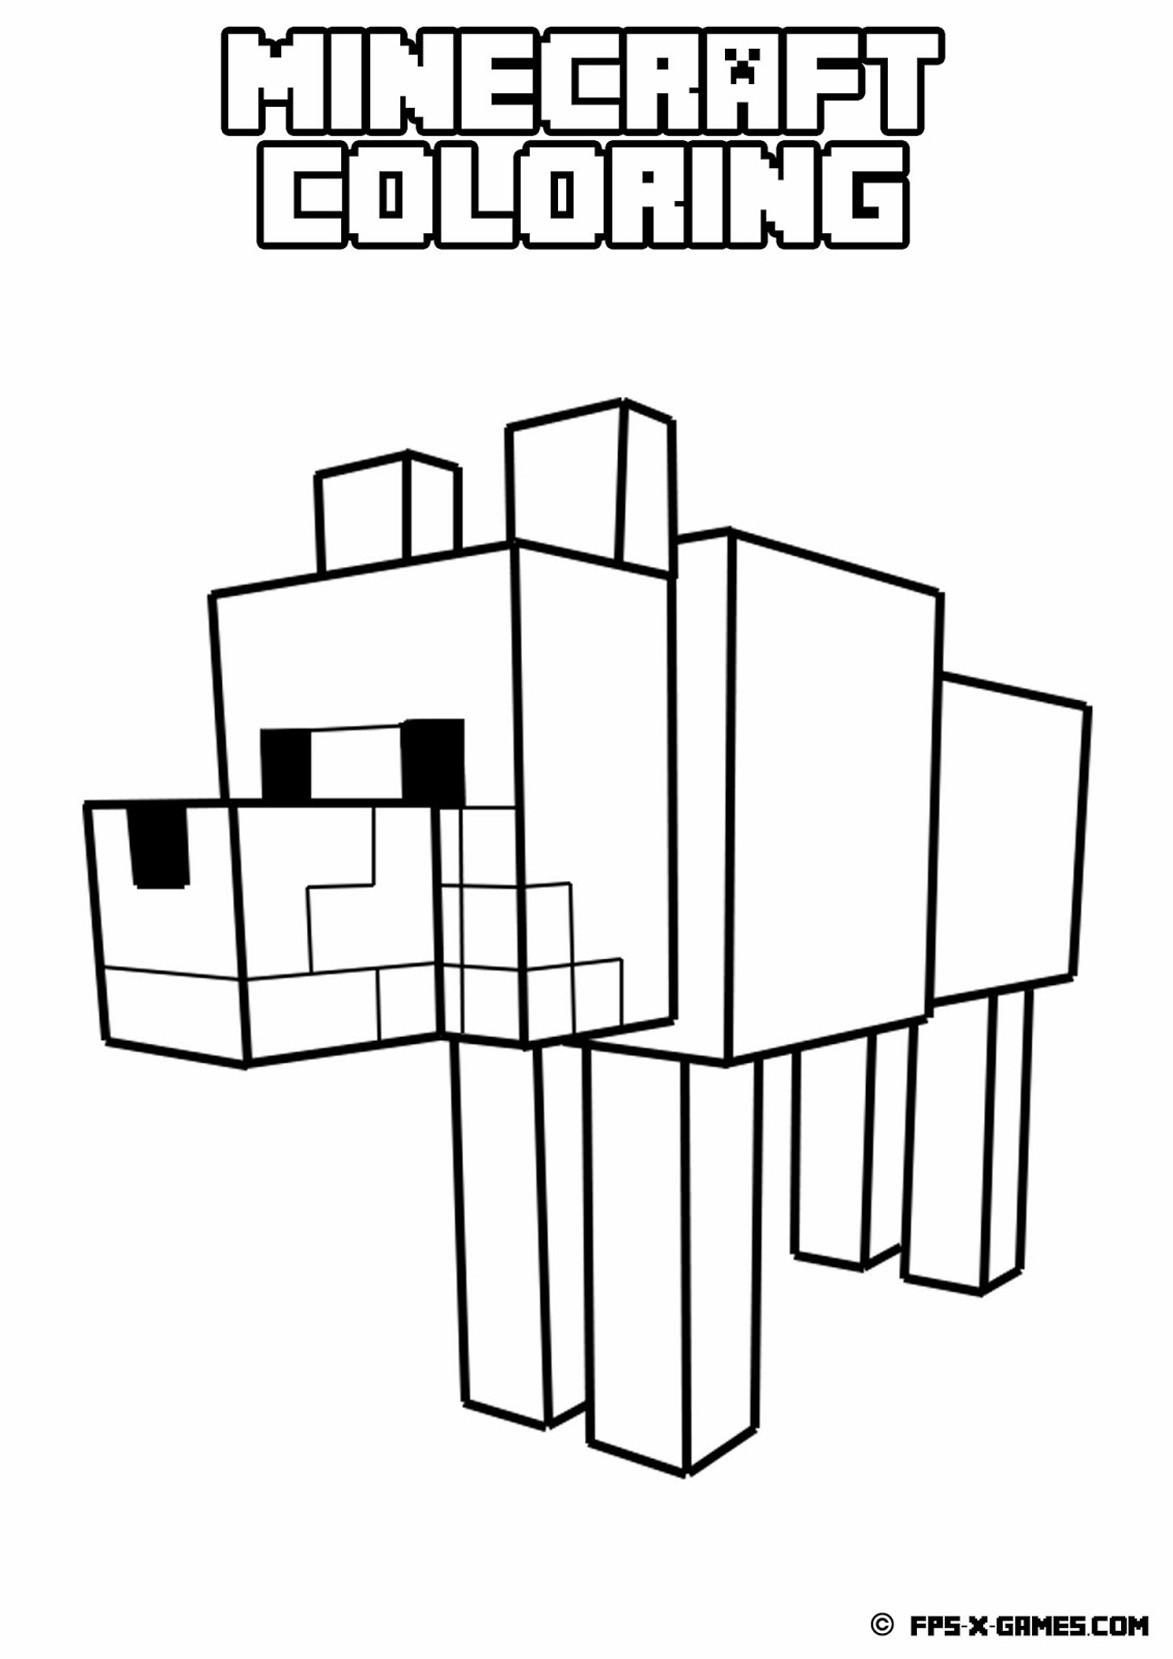 Ausmalbilder Minecraft Schwert : Minecraft Diamond Sword Drawing At Getdrawings Com Free For